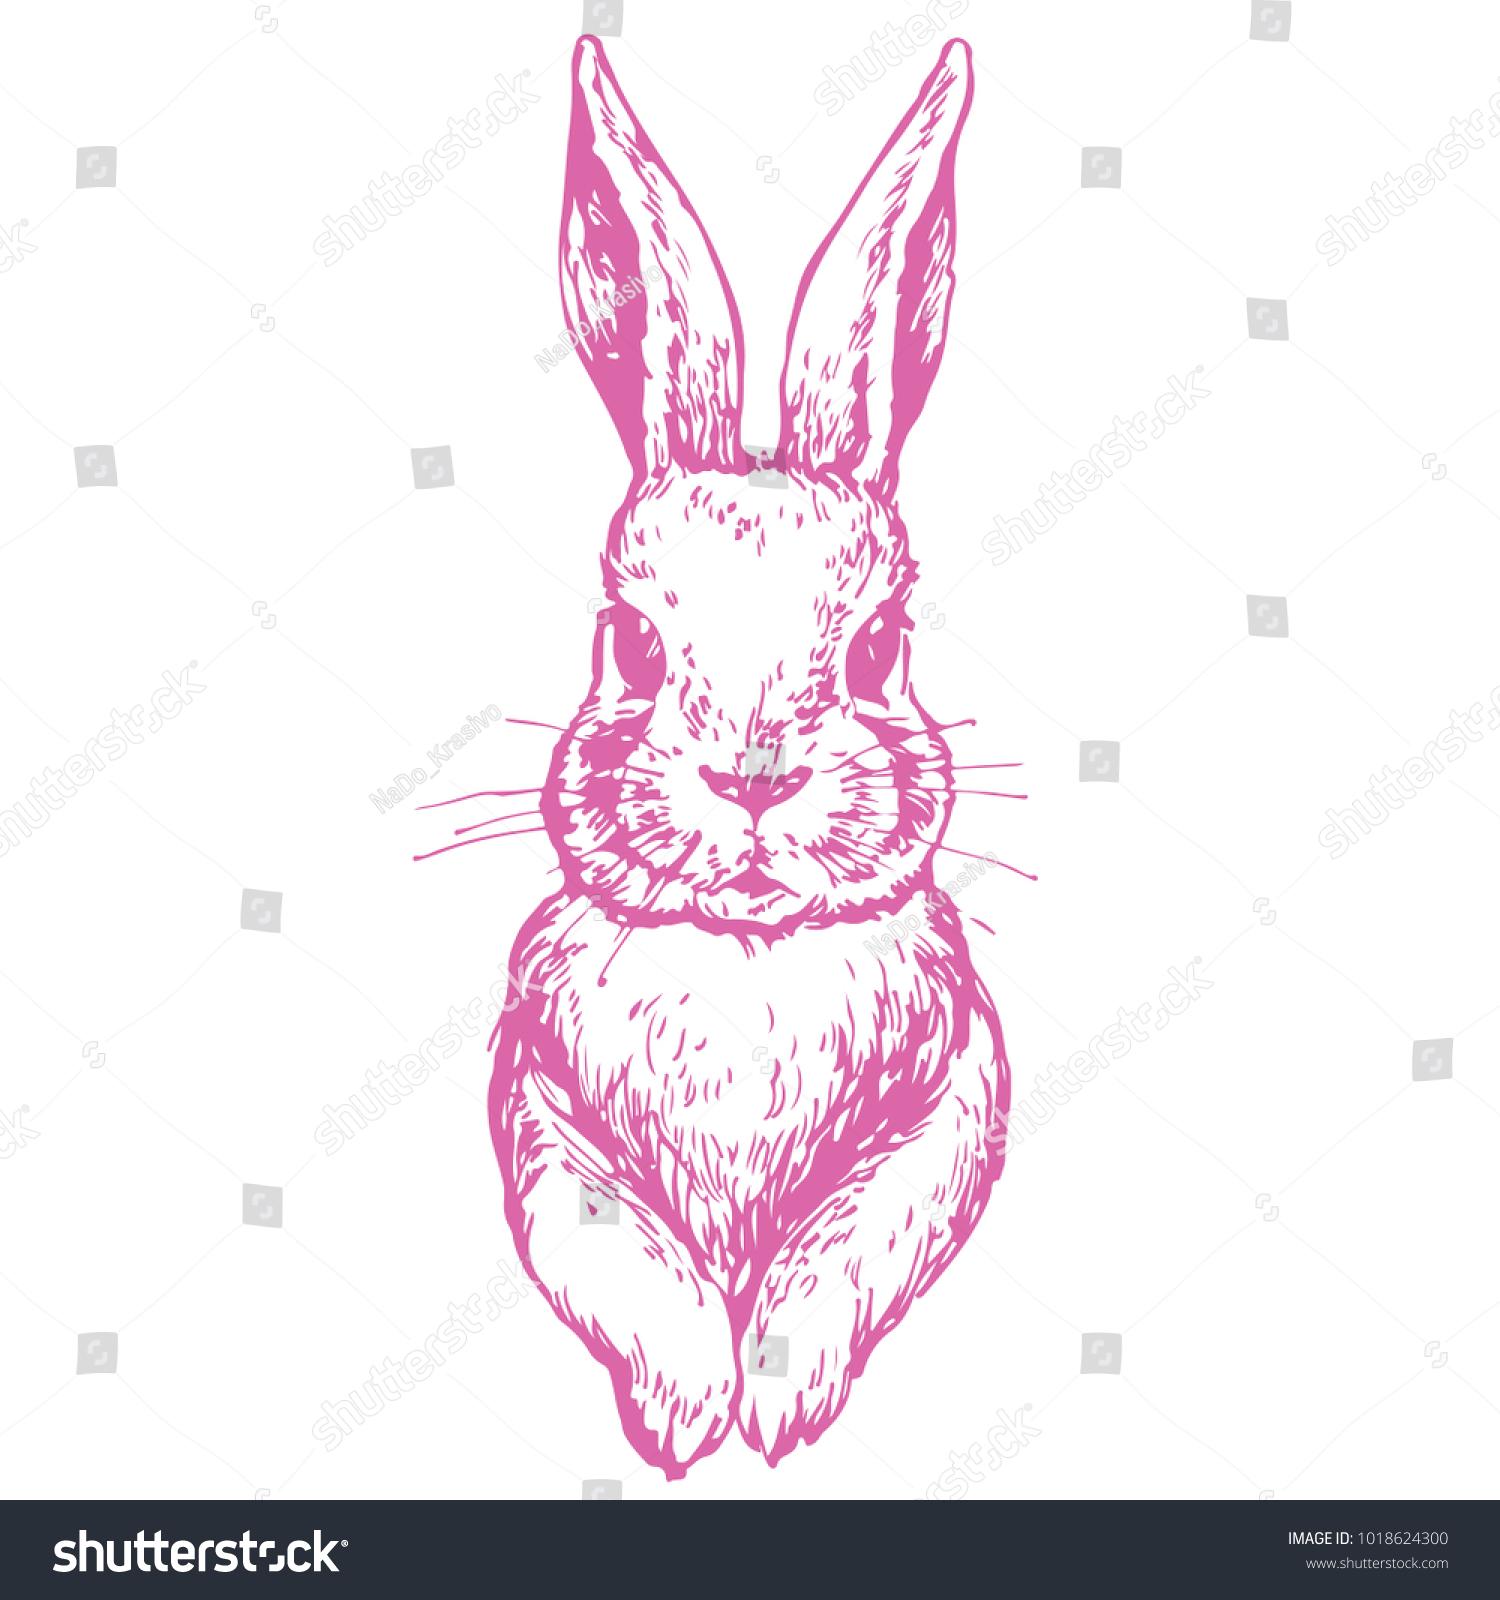 Bunny Cute Rabbit Animal Ink Hand Stock Vector (Royalty Free ...